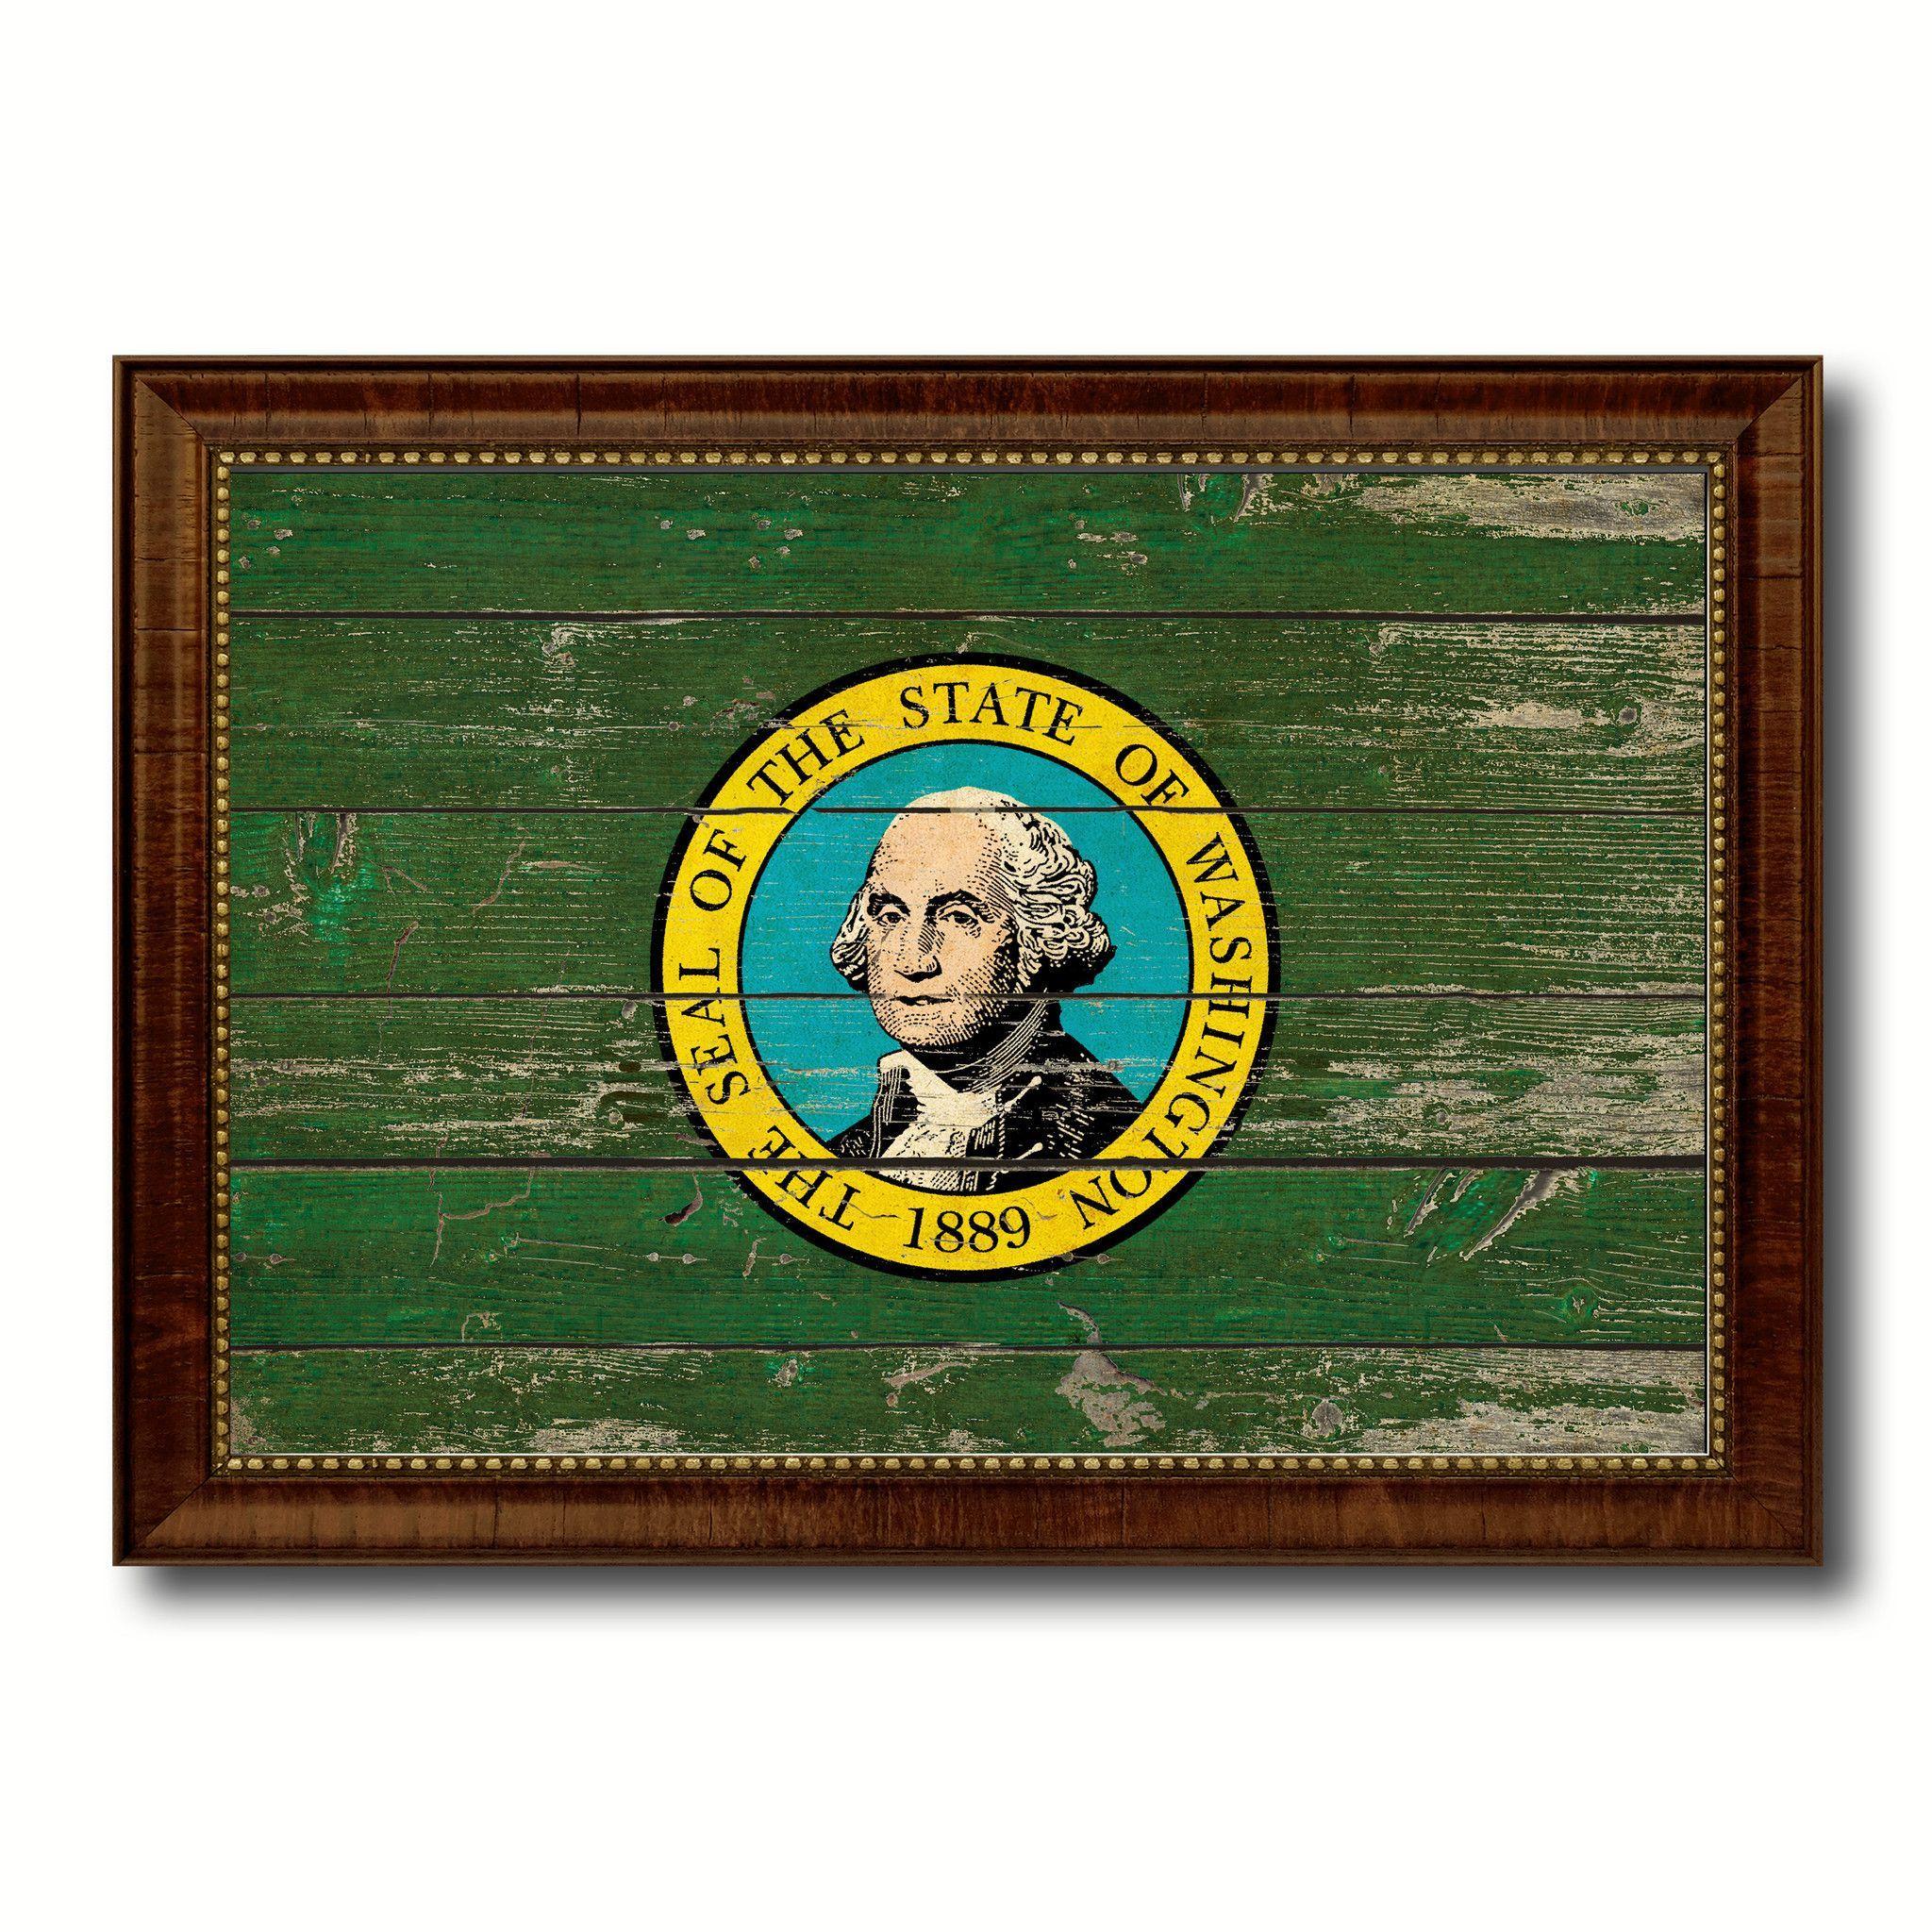 Washington Vintage Flag Canvas Print, Picture Frame Gift Ideas Home Décor Wall Art Decoration